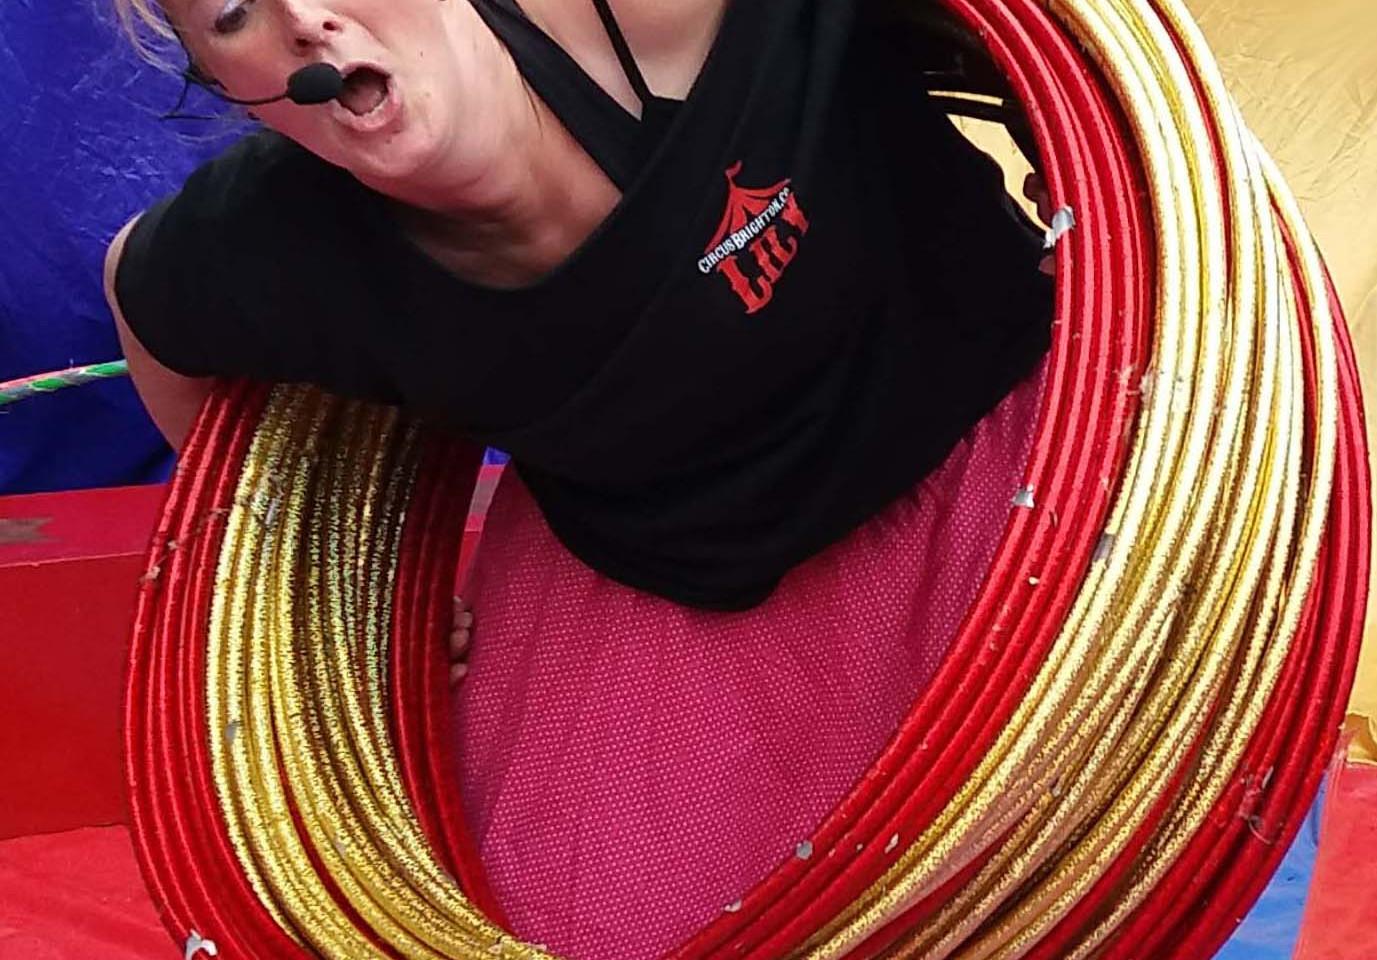 lily hoop struggle.jpg